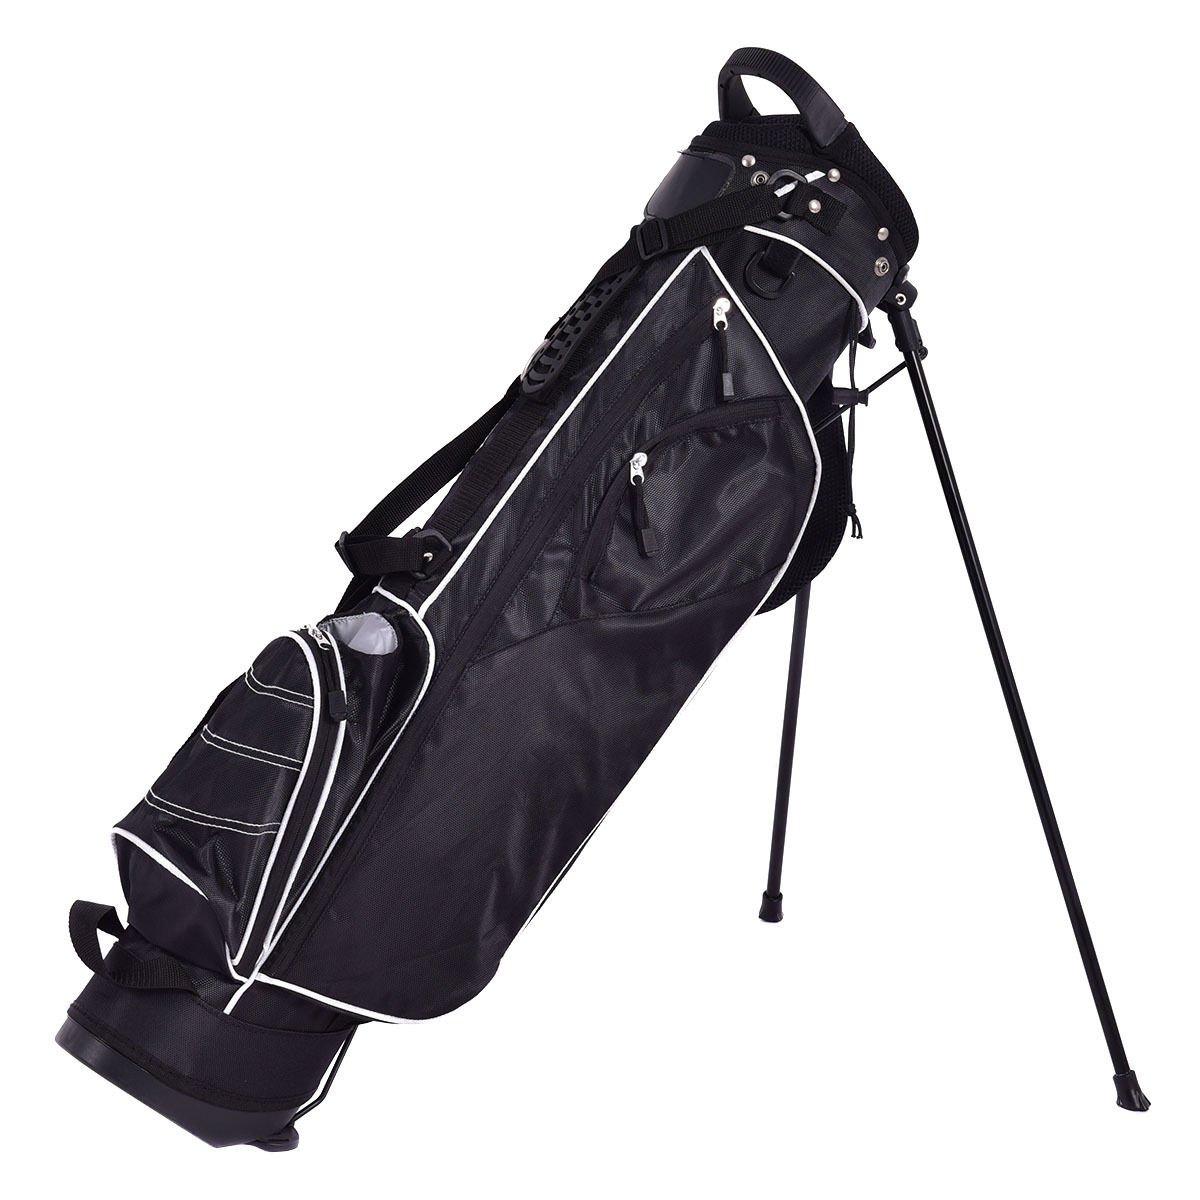 7dd2d6113c28 Amazon.com : COLIBROX--Golf Stand Cart Bag Club w/4 Way Divider ...